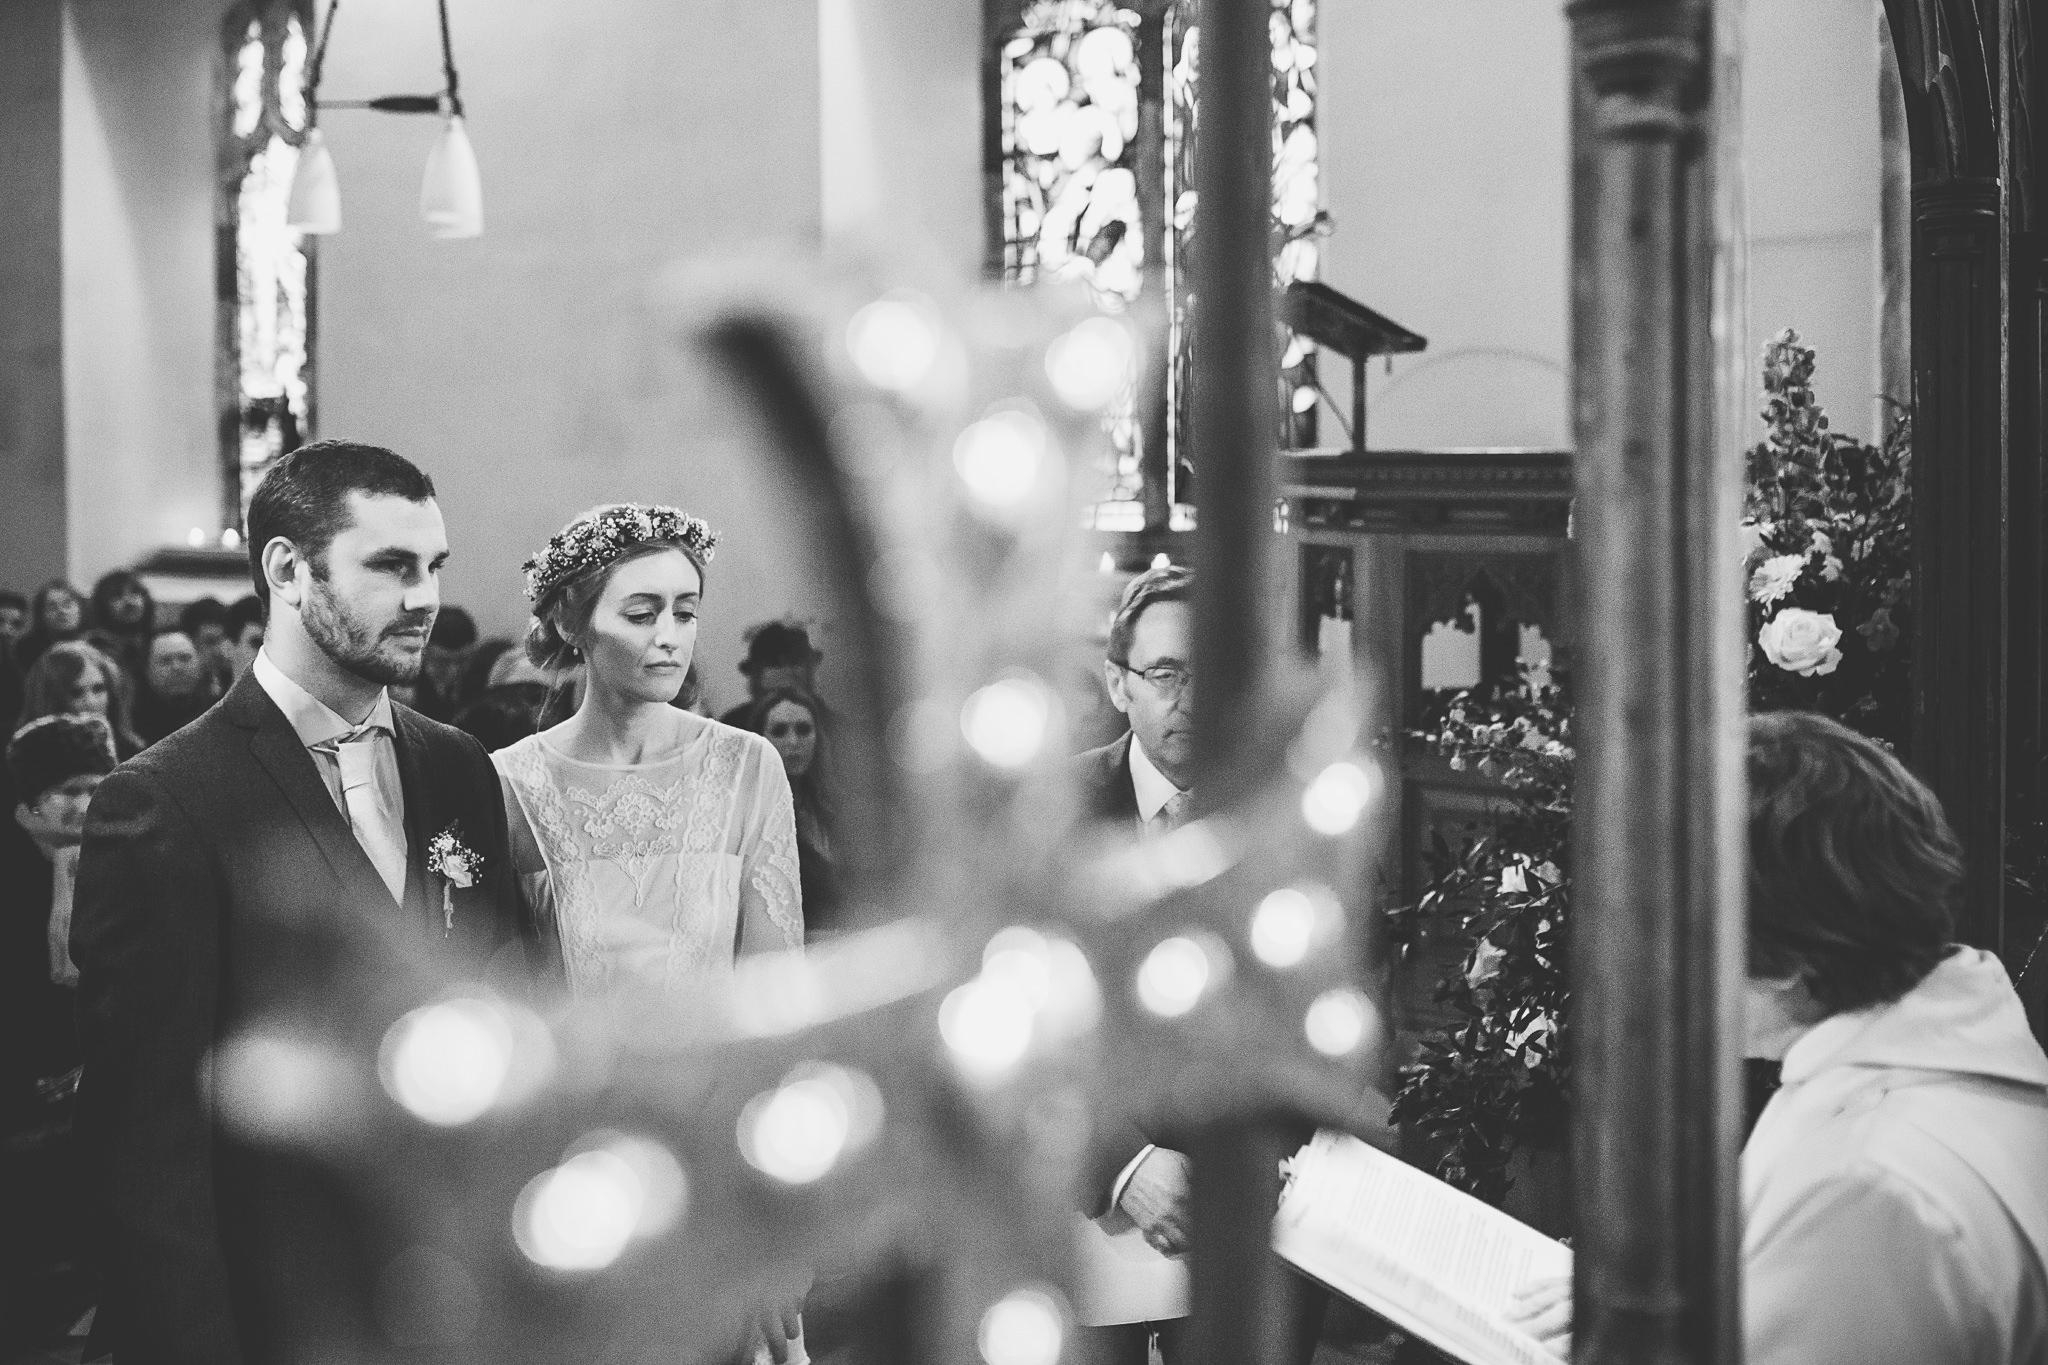 Creative-reportage-wedding-photography-90022